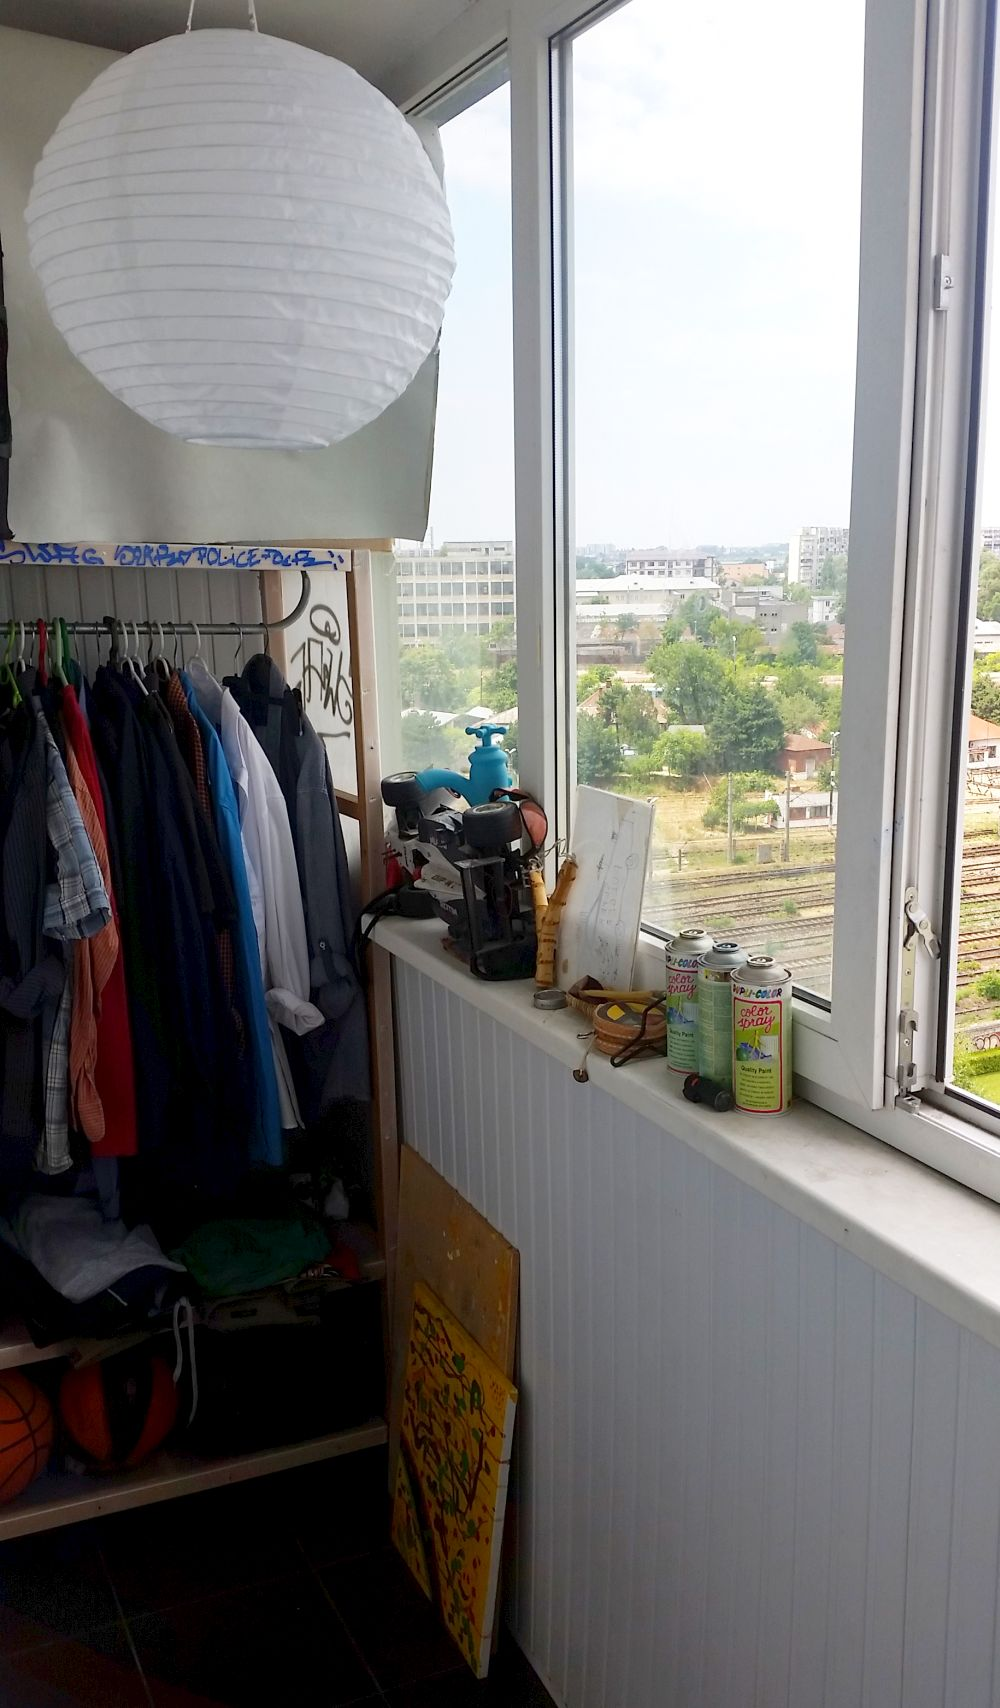 adelaparvu.com despe schimbari mici efecte mari, experiment IKEA sustenabilitate (6)